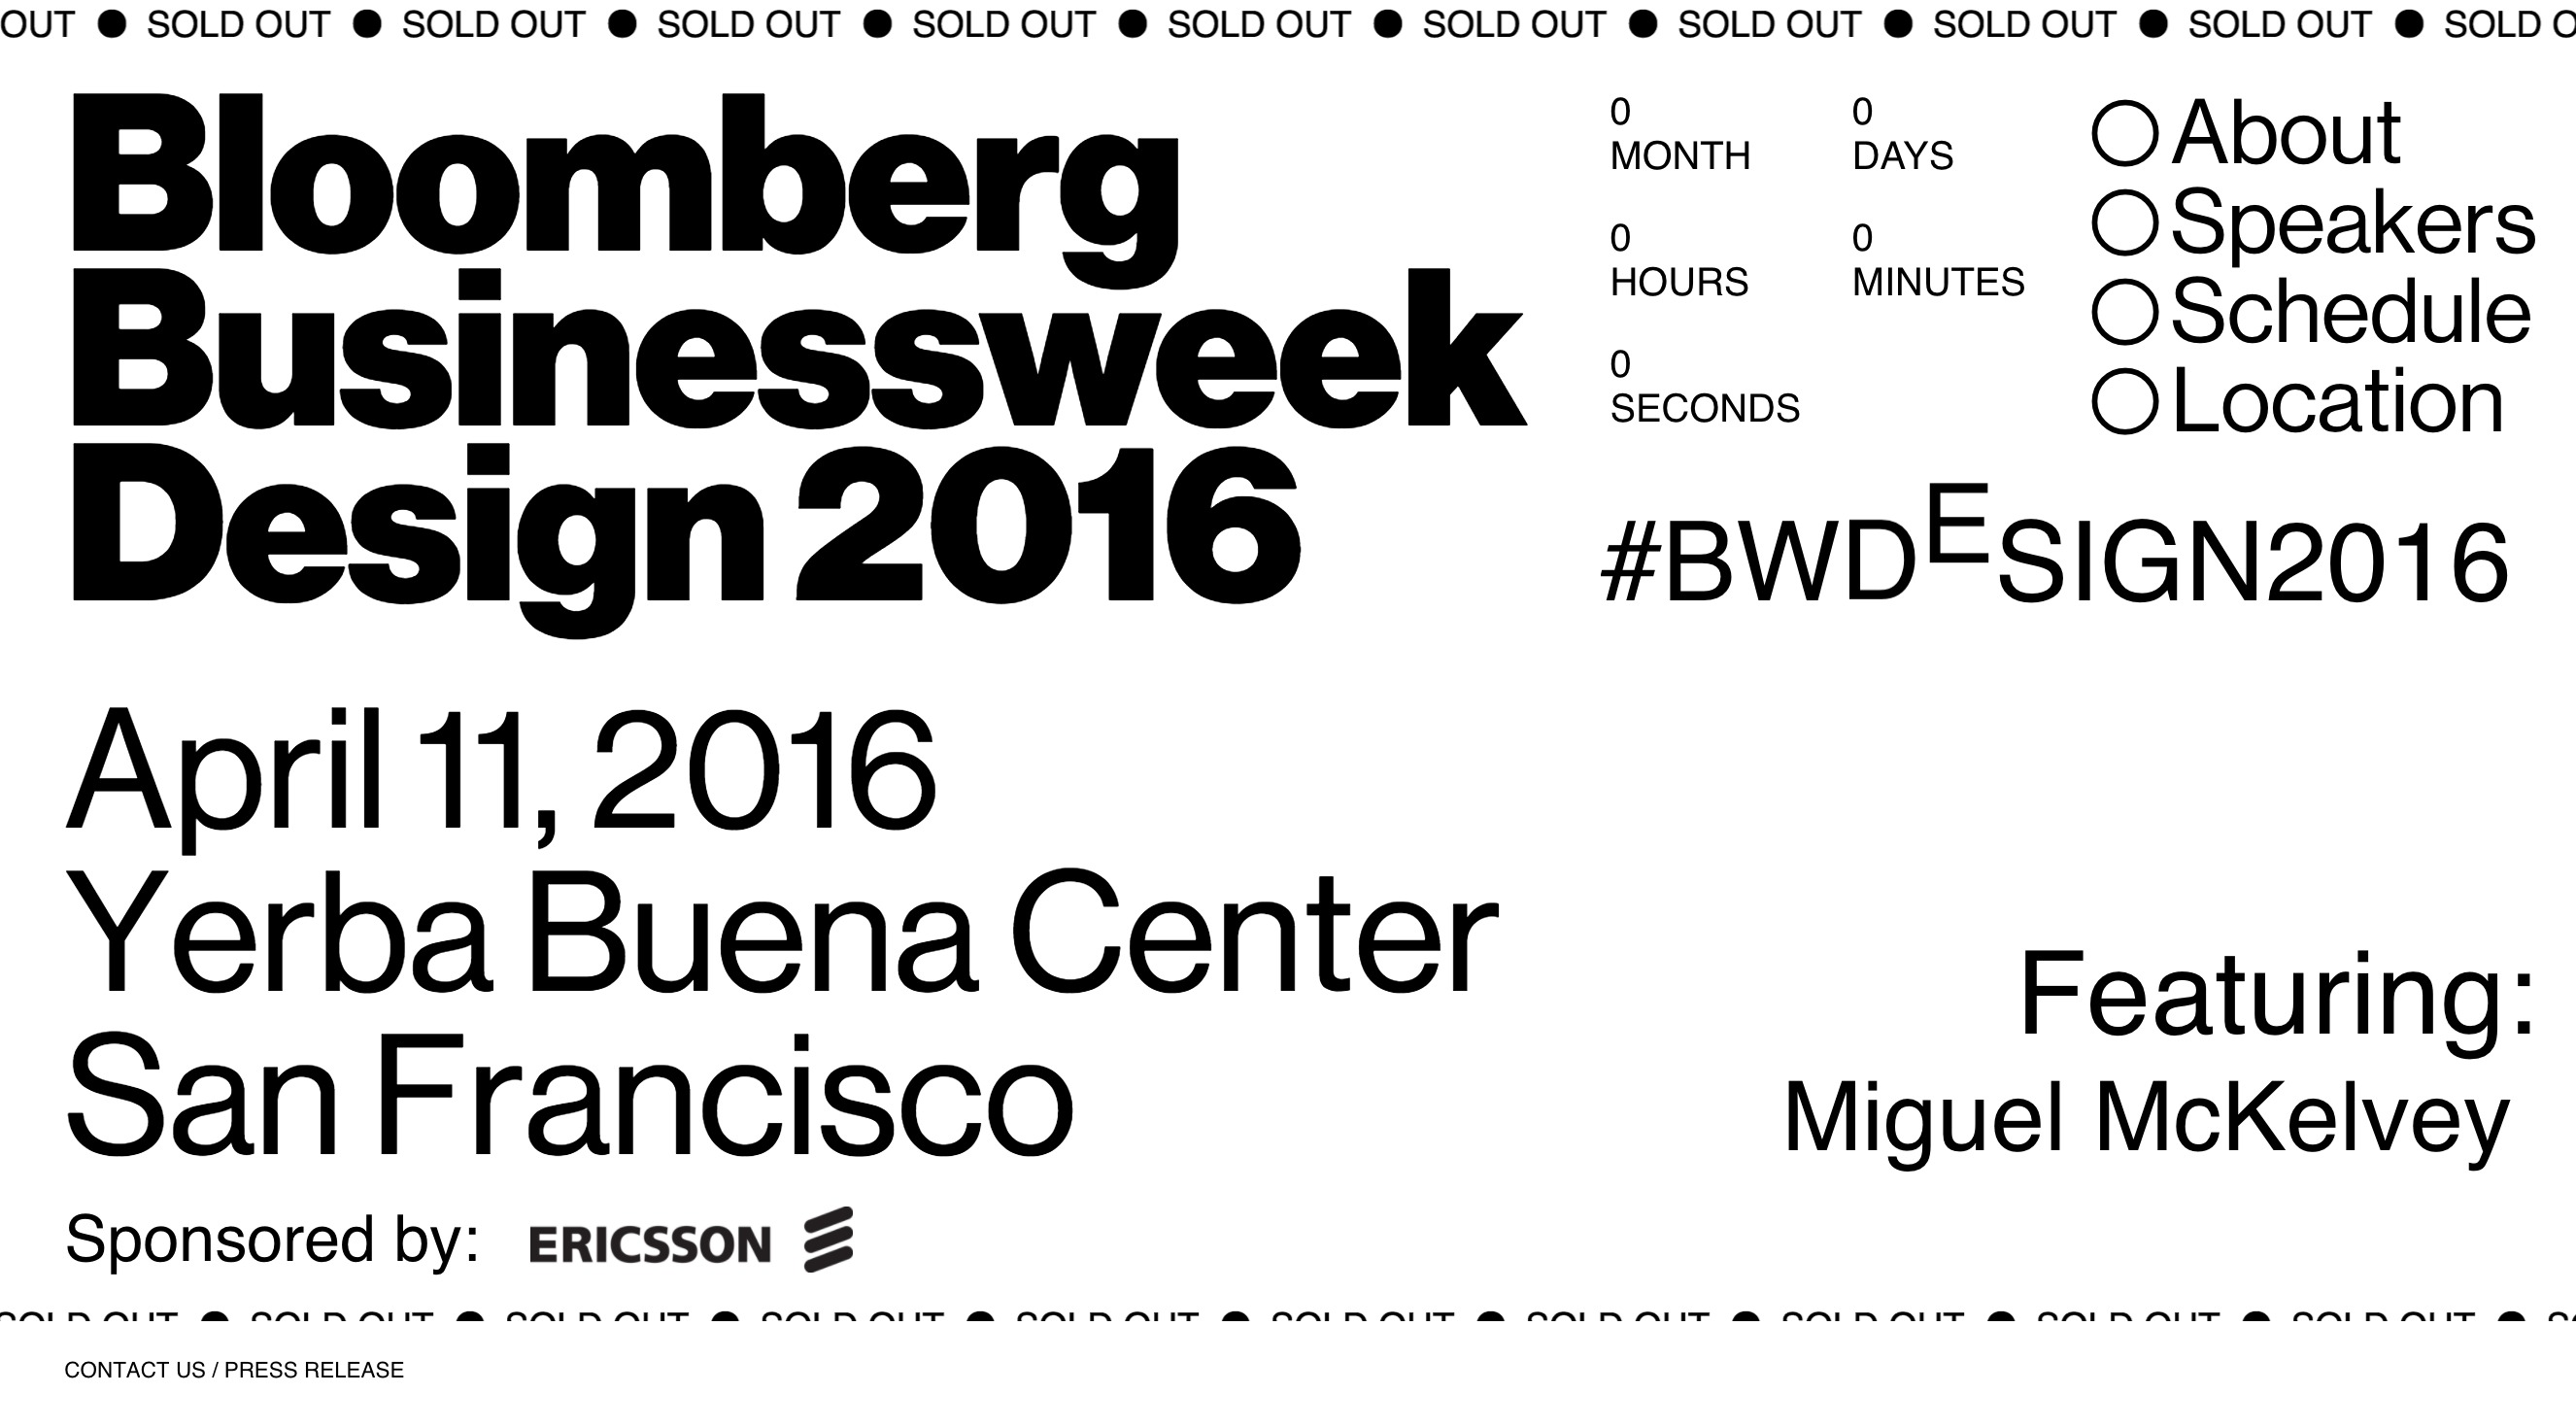 bloomberg-businessweek-design-2016